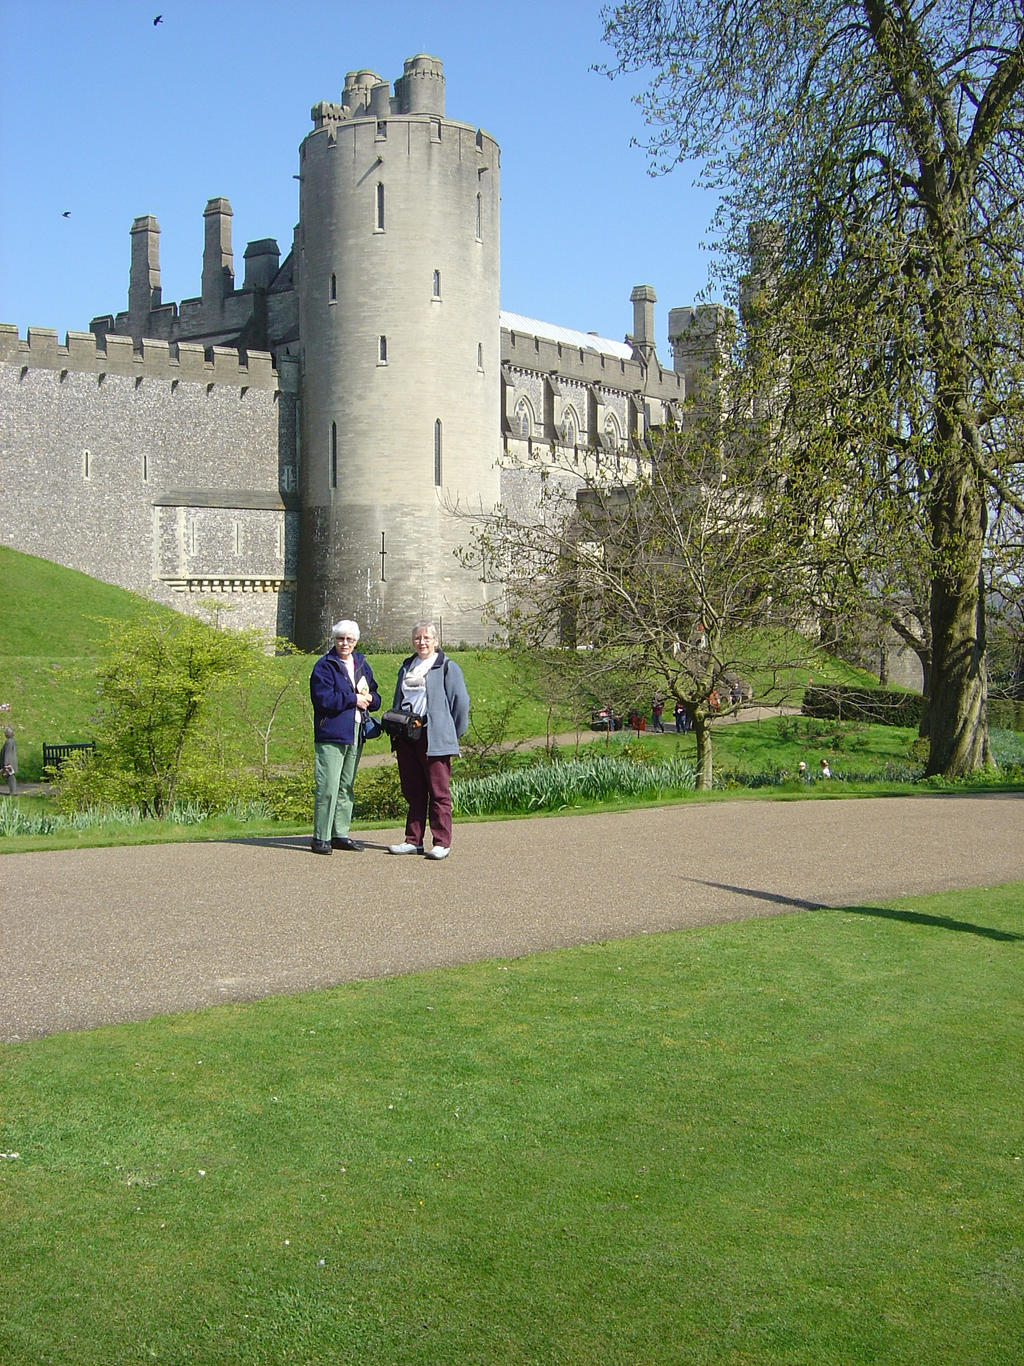 DSC00302  Arundel Castle by VIRGOLINEDANCER1